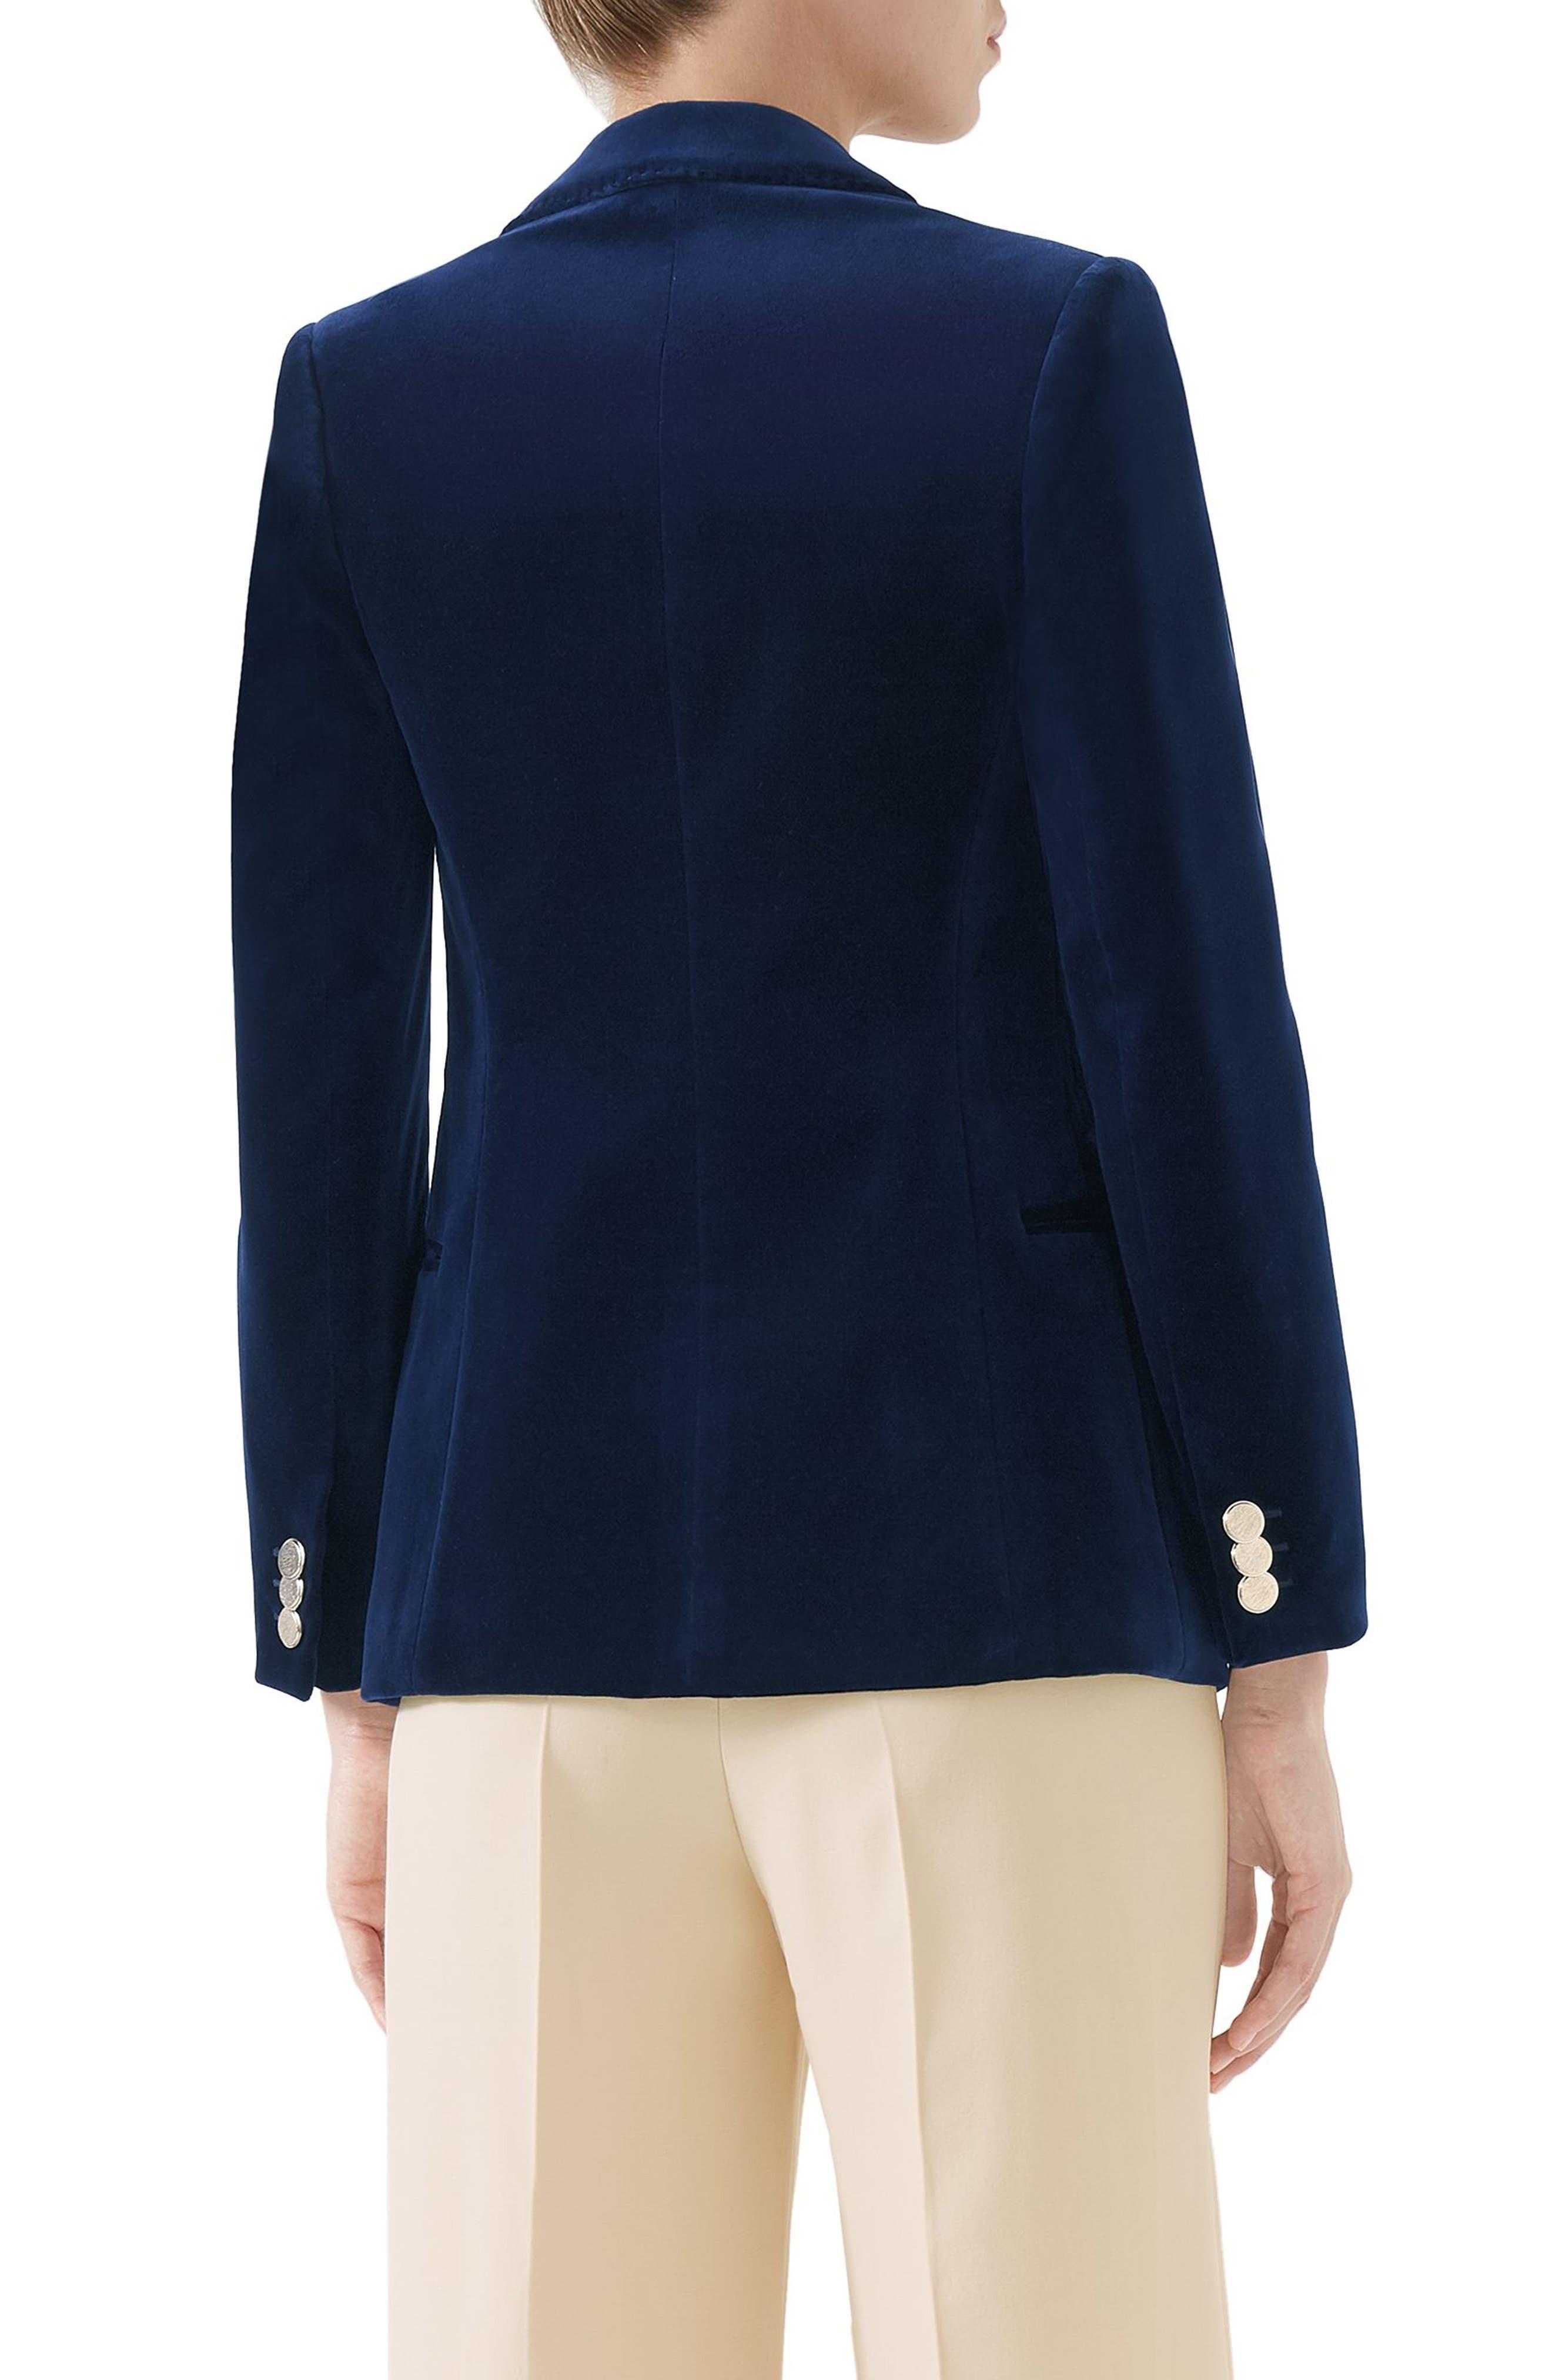 NY Patch Velvet Jacket,                             Alternate thumbnail 2, color,                             BLUE